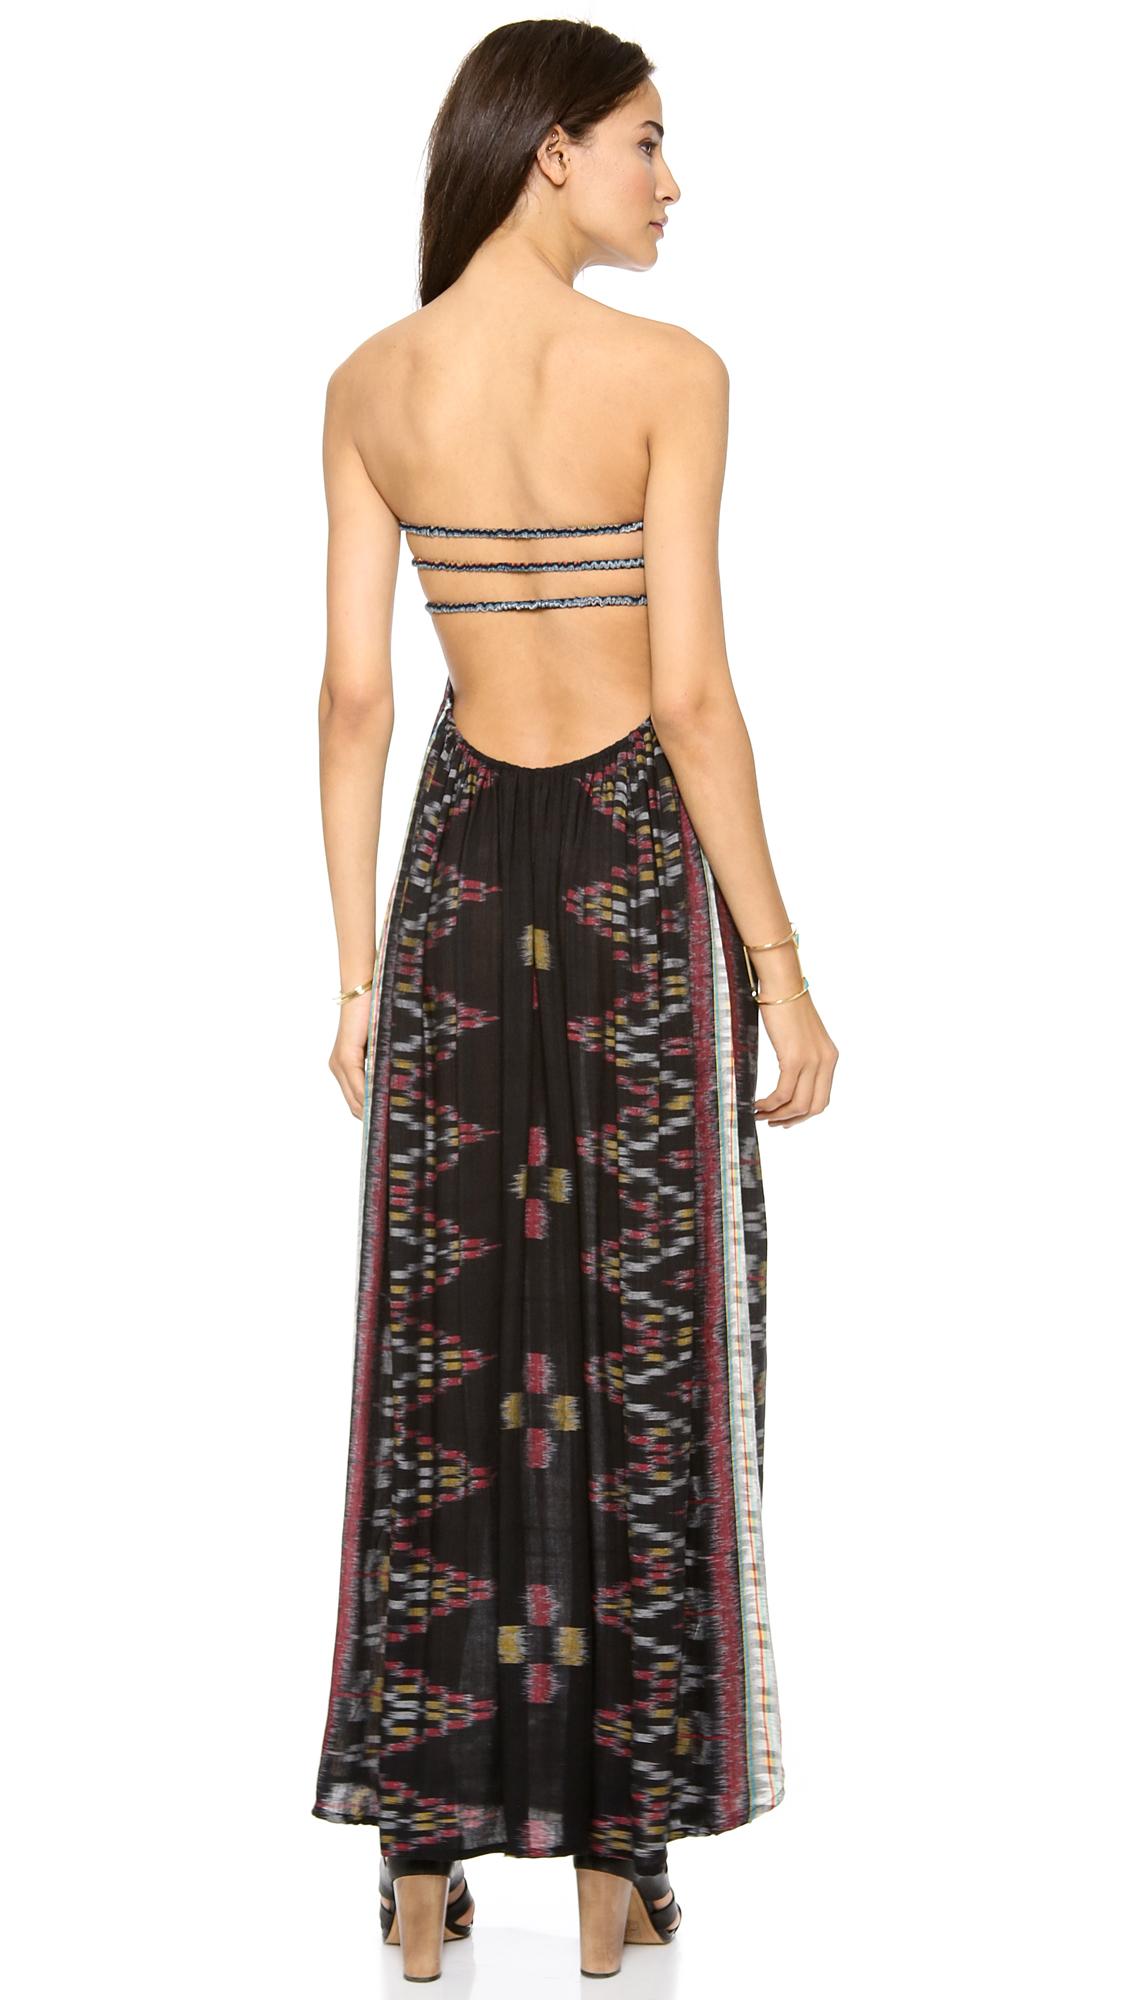 6796f54046c Indah Flamingo Bandeau Maxi Dress